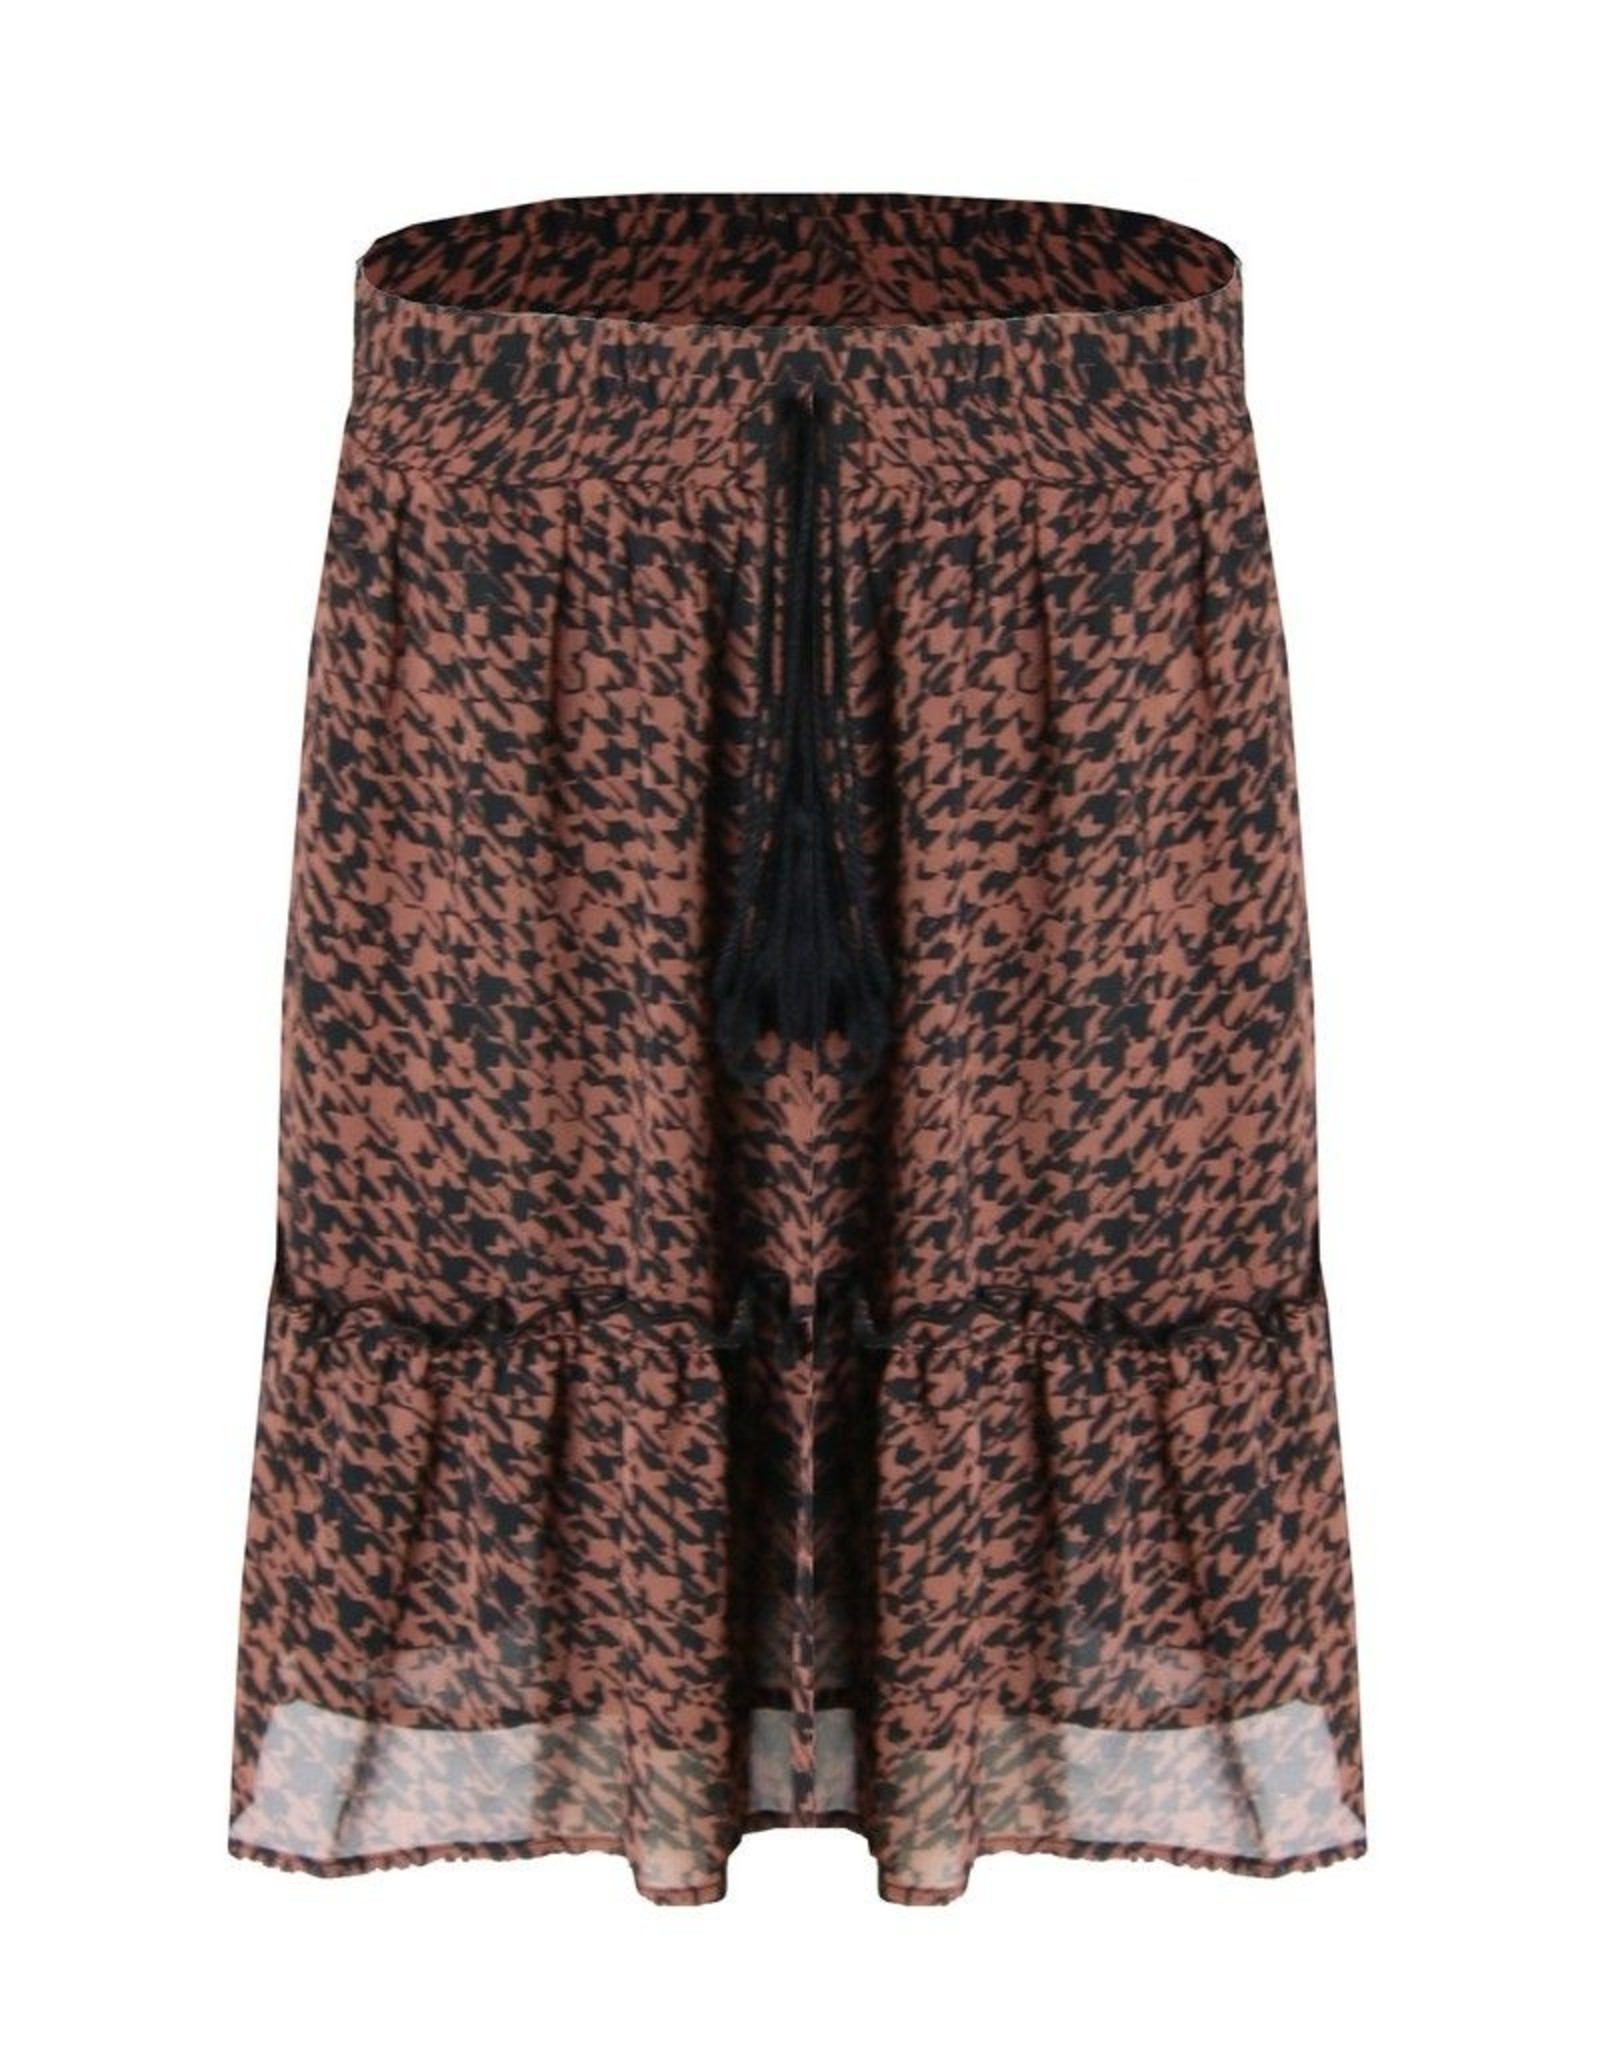 C&S Skirt Rusty Brown Black with Ruffles